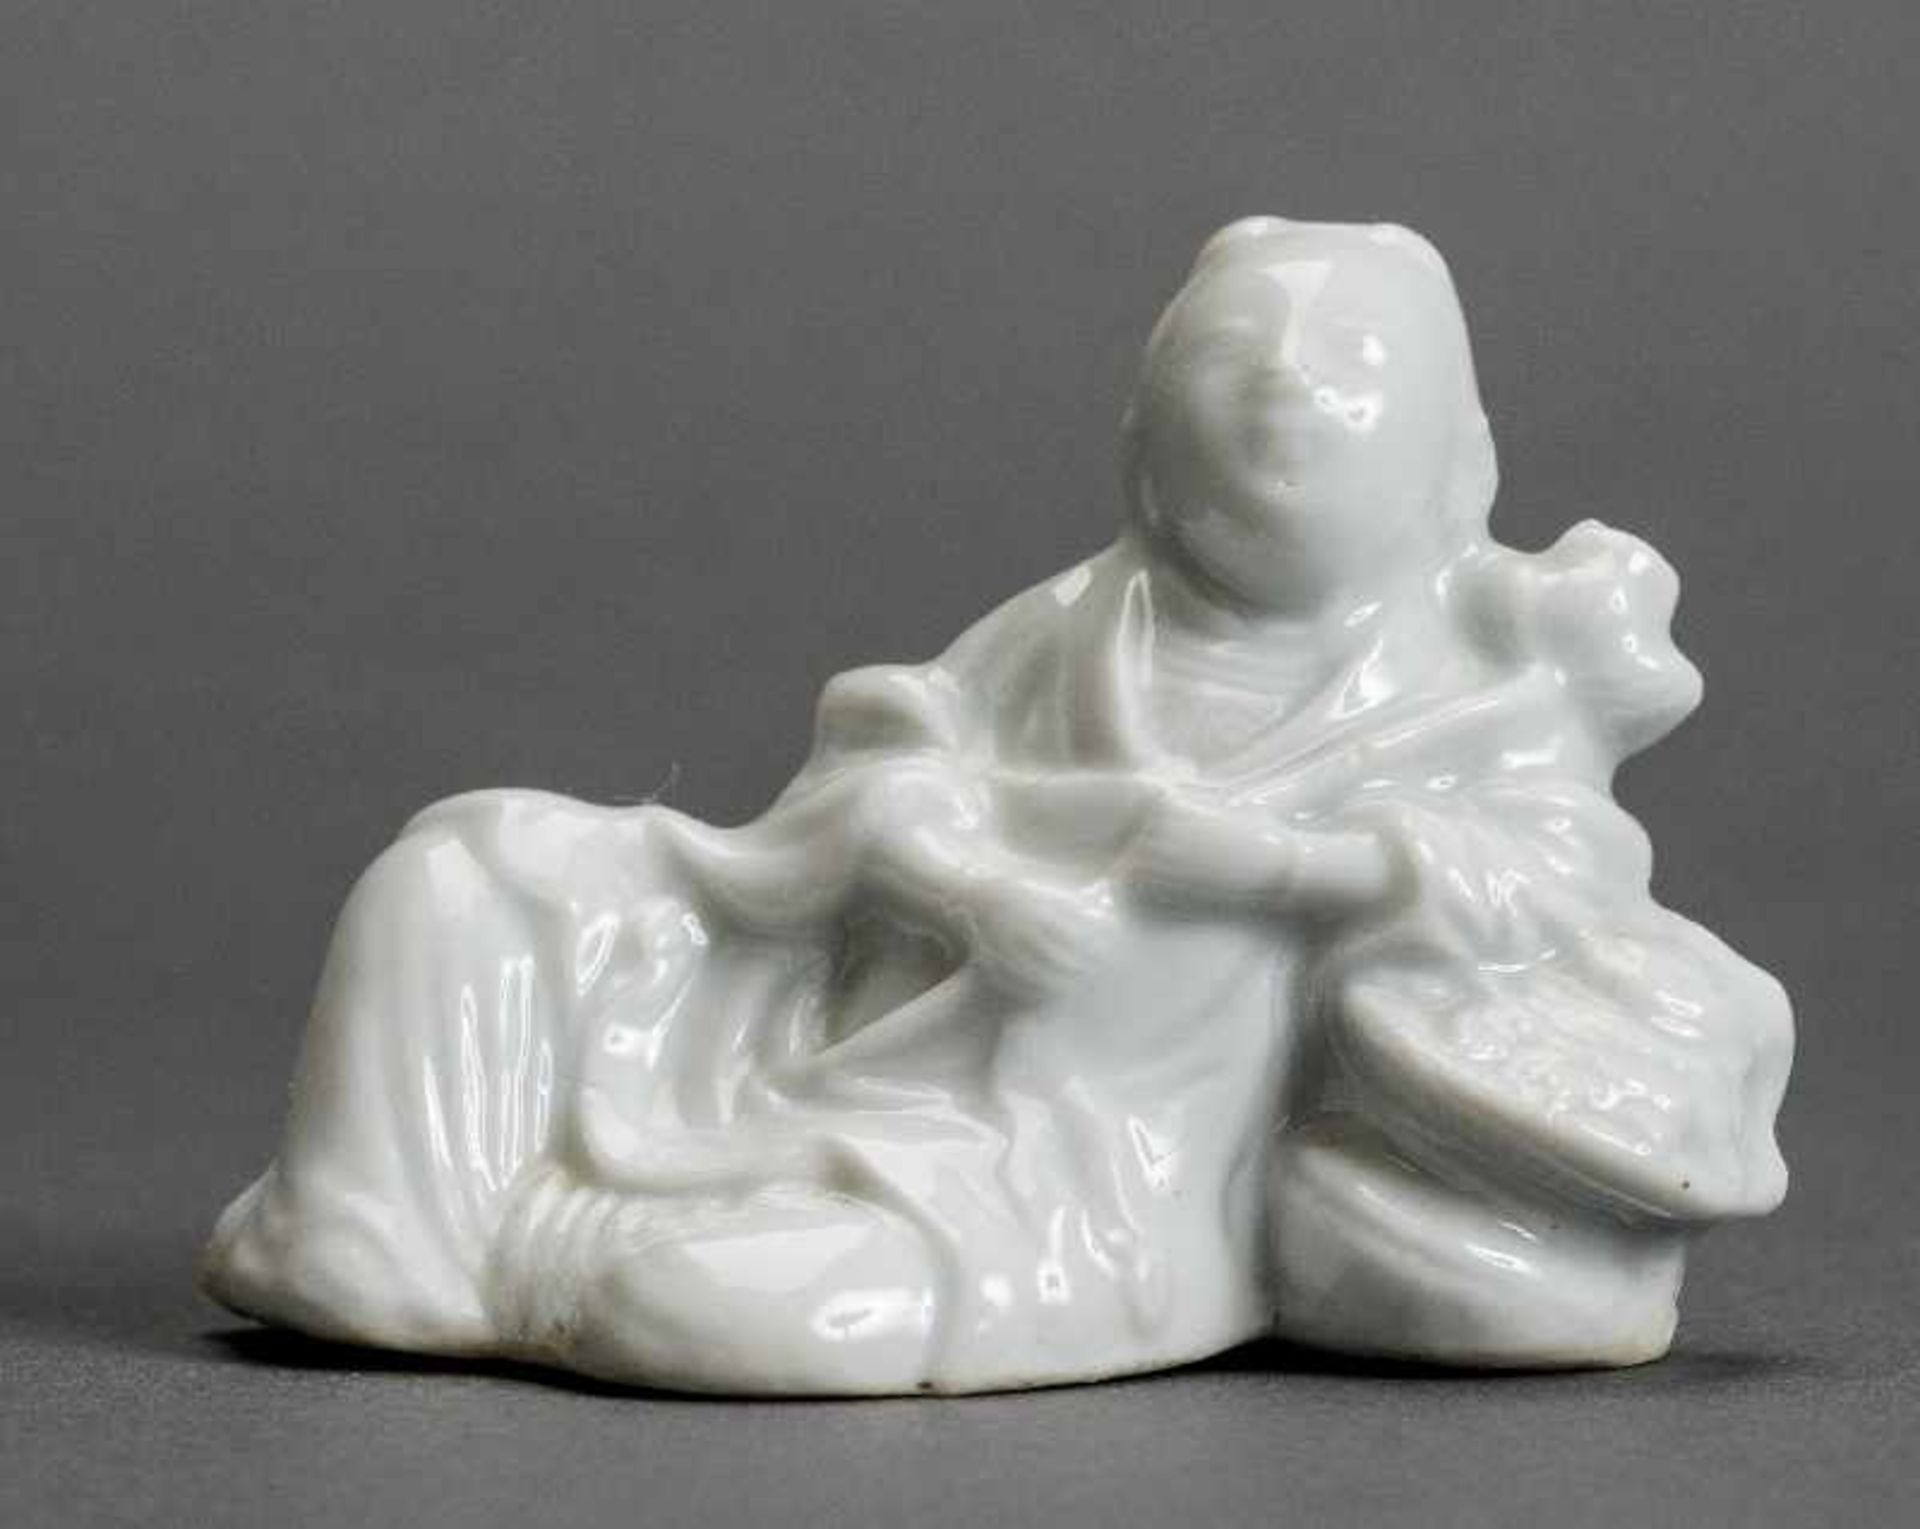 DIE UNSTERBLICHE LAN CAIHE Blanc de Chine. China, Qing-Dynastie (1644 - 1911) Lan Caihe ist neben He